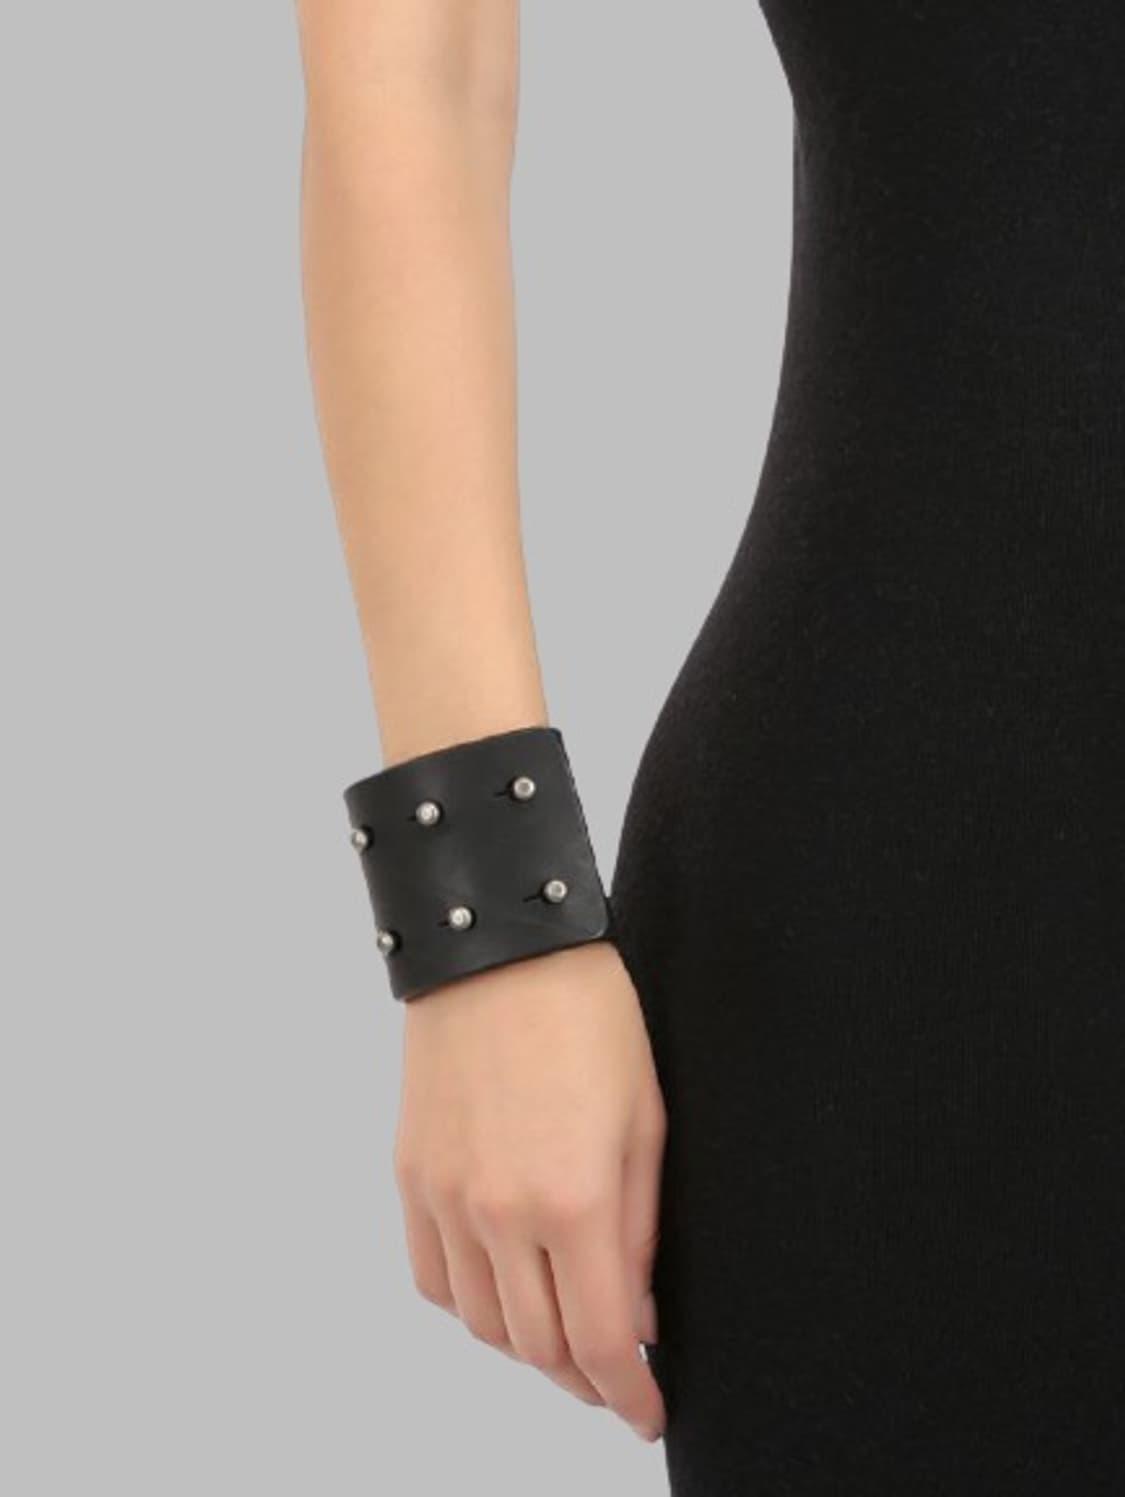 Rick Owens Black Leather Brace